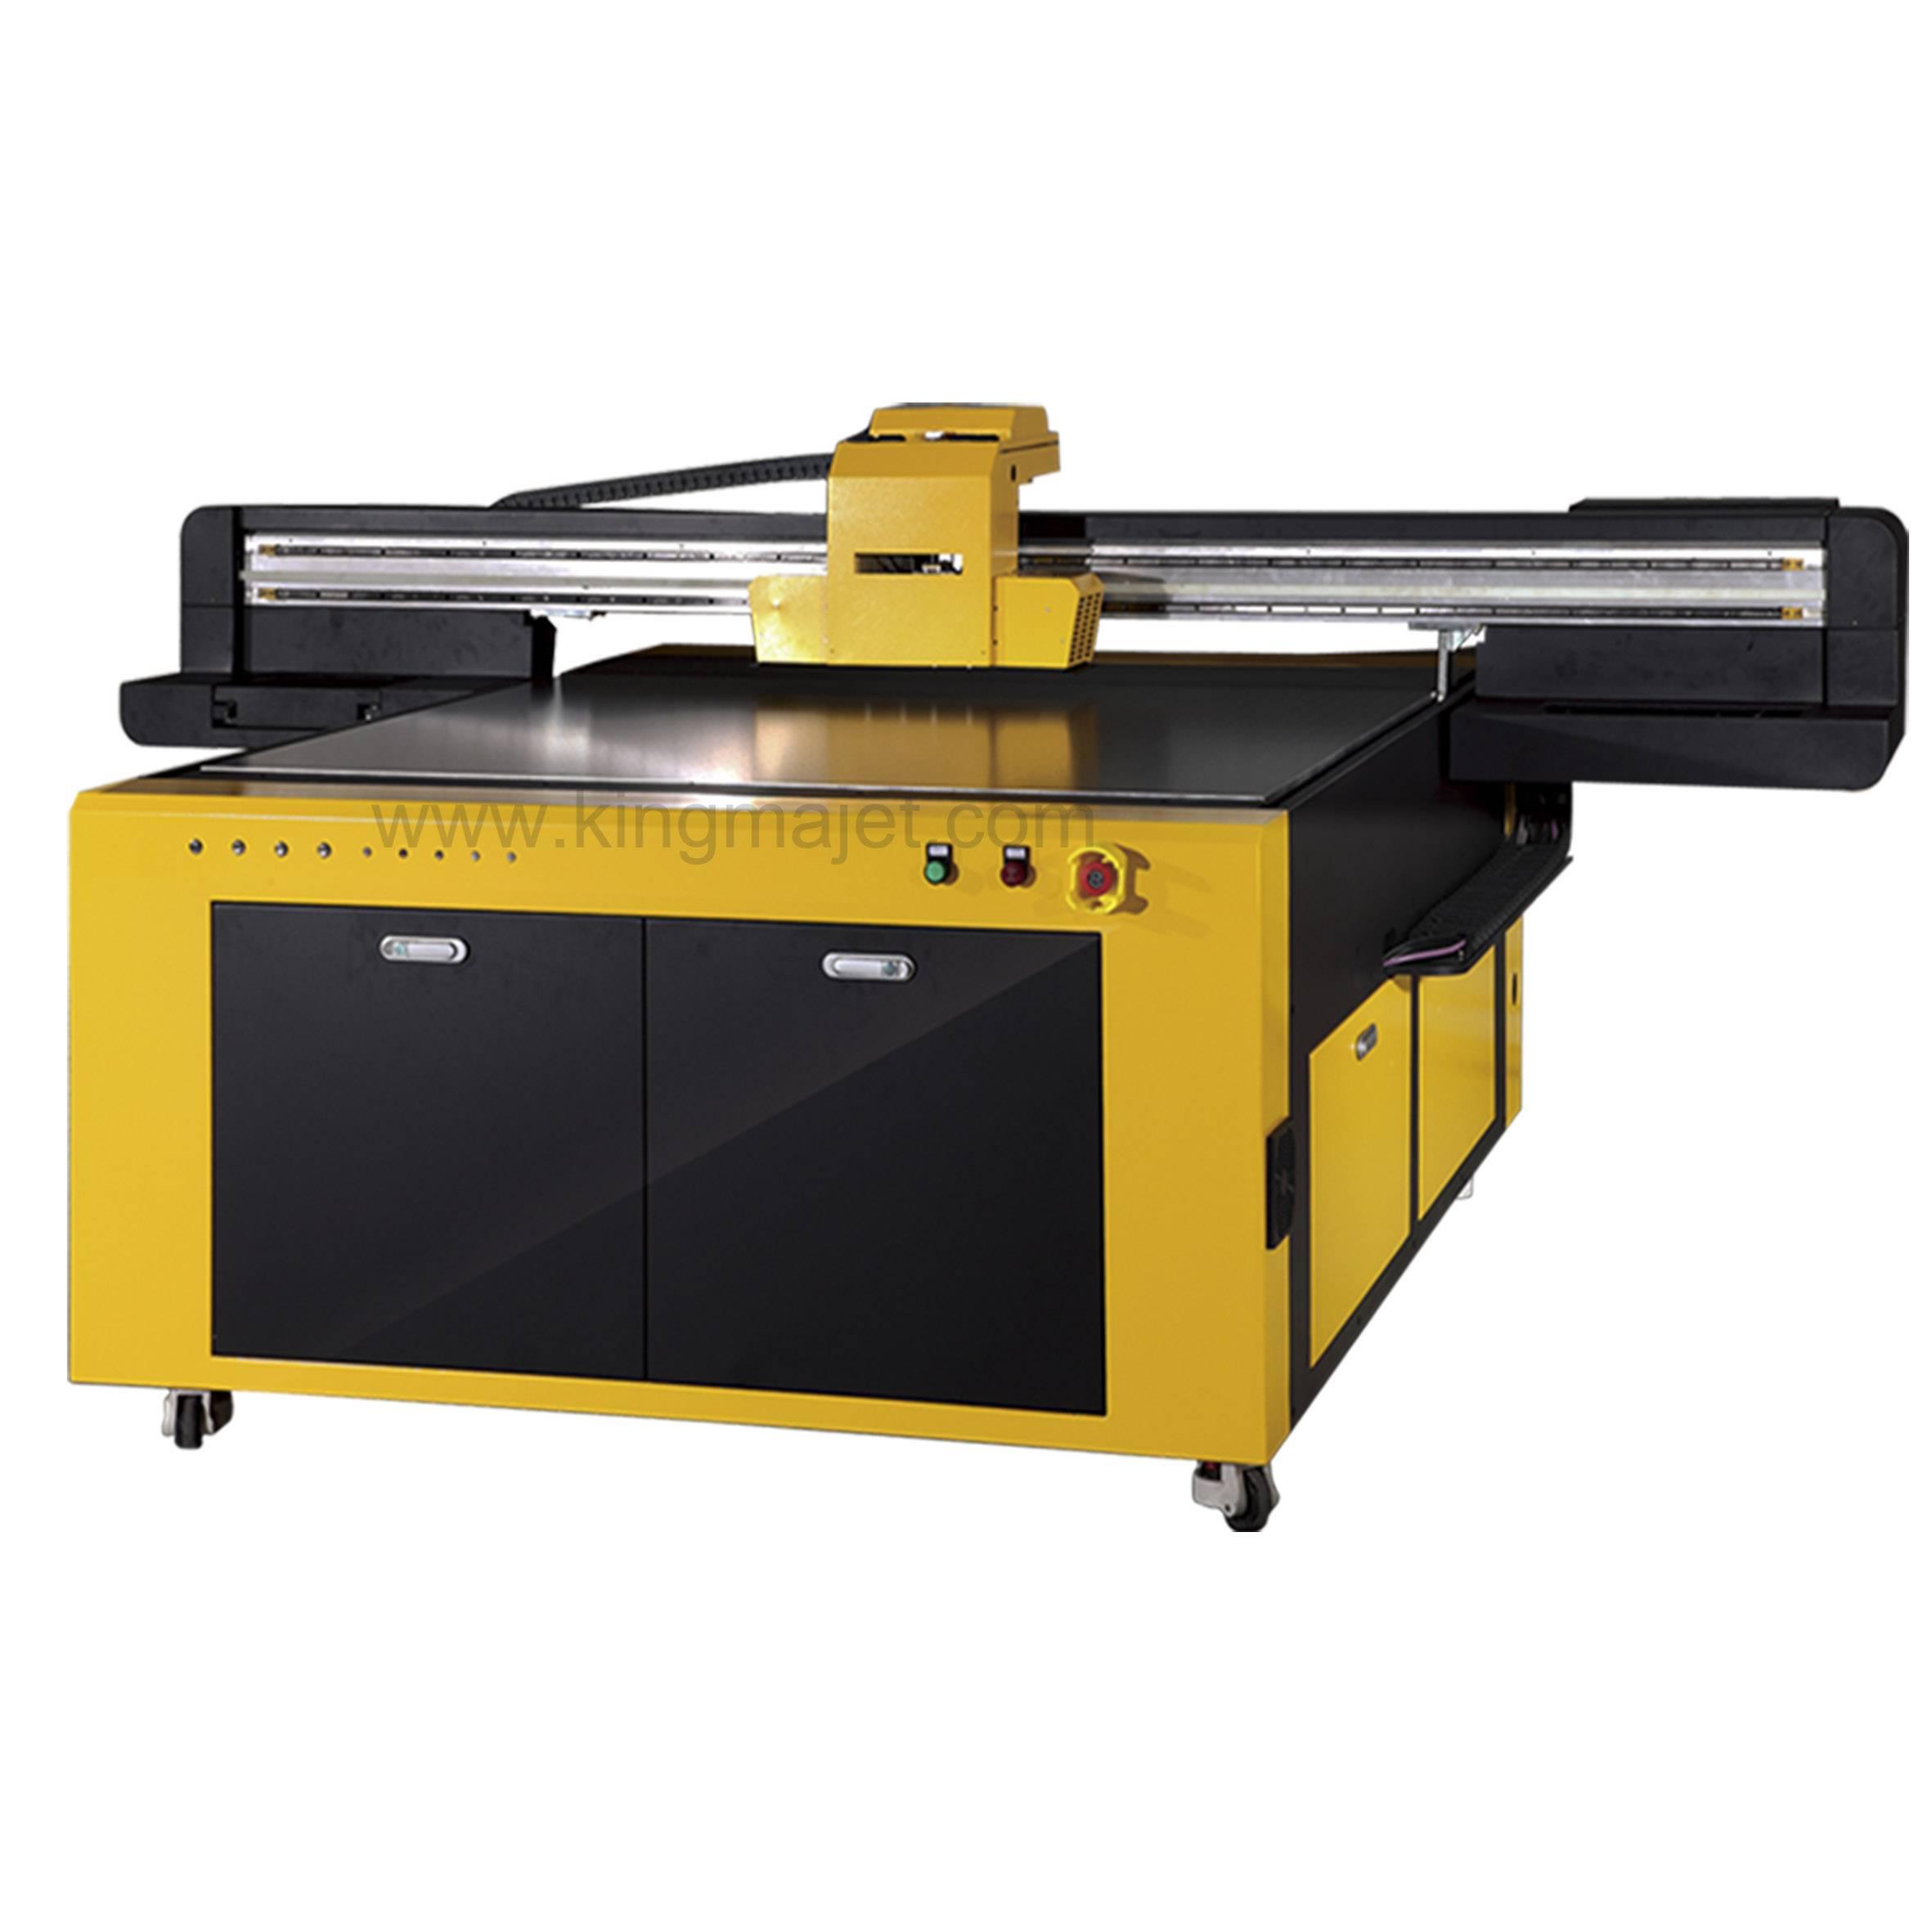 Weihang MJ-UV2513 Digital UV Flatbed Printer